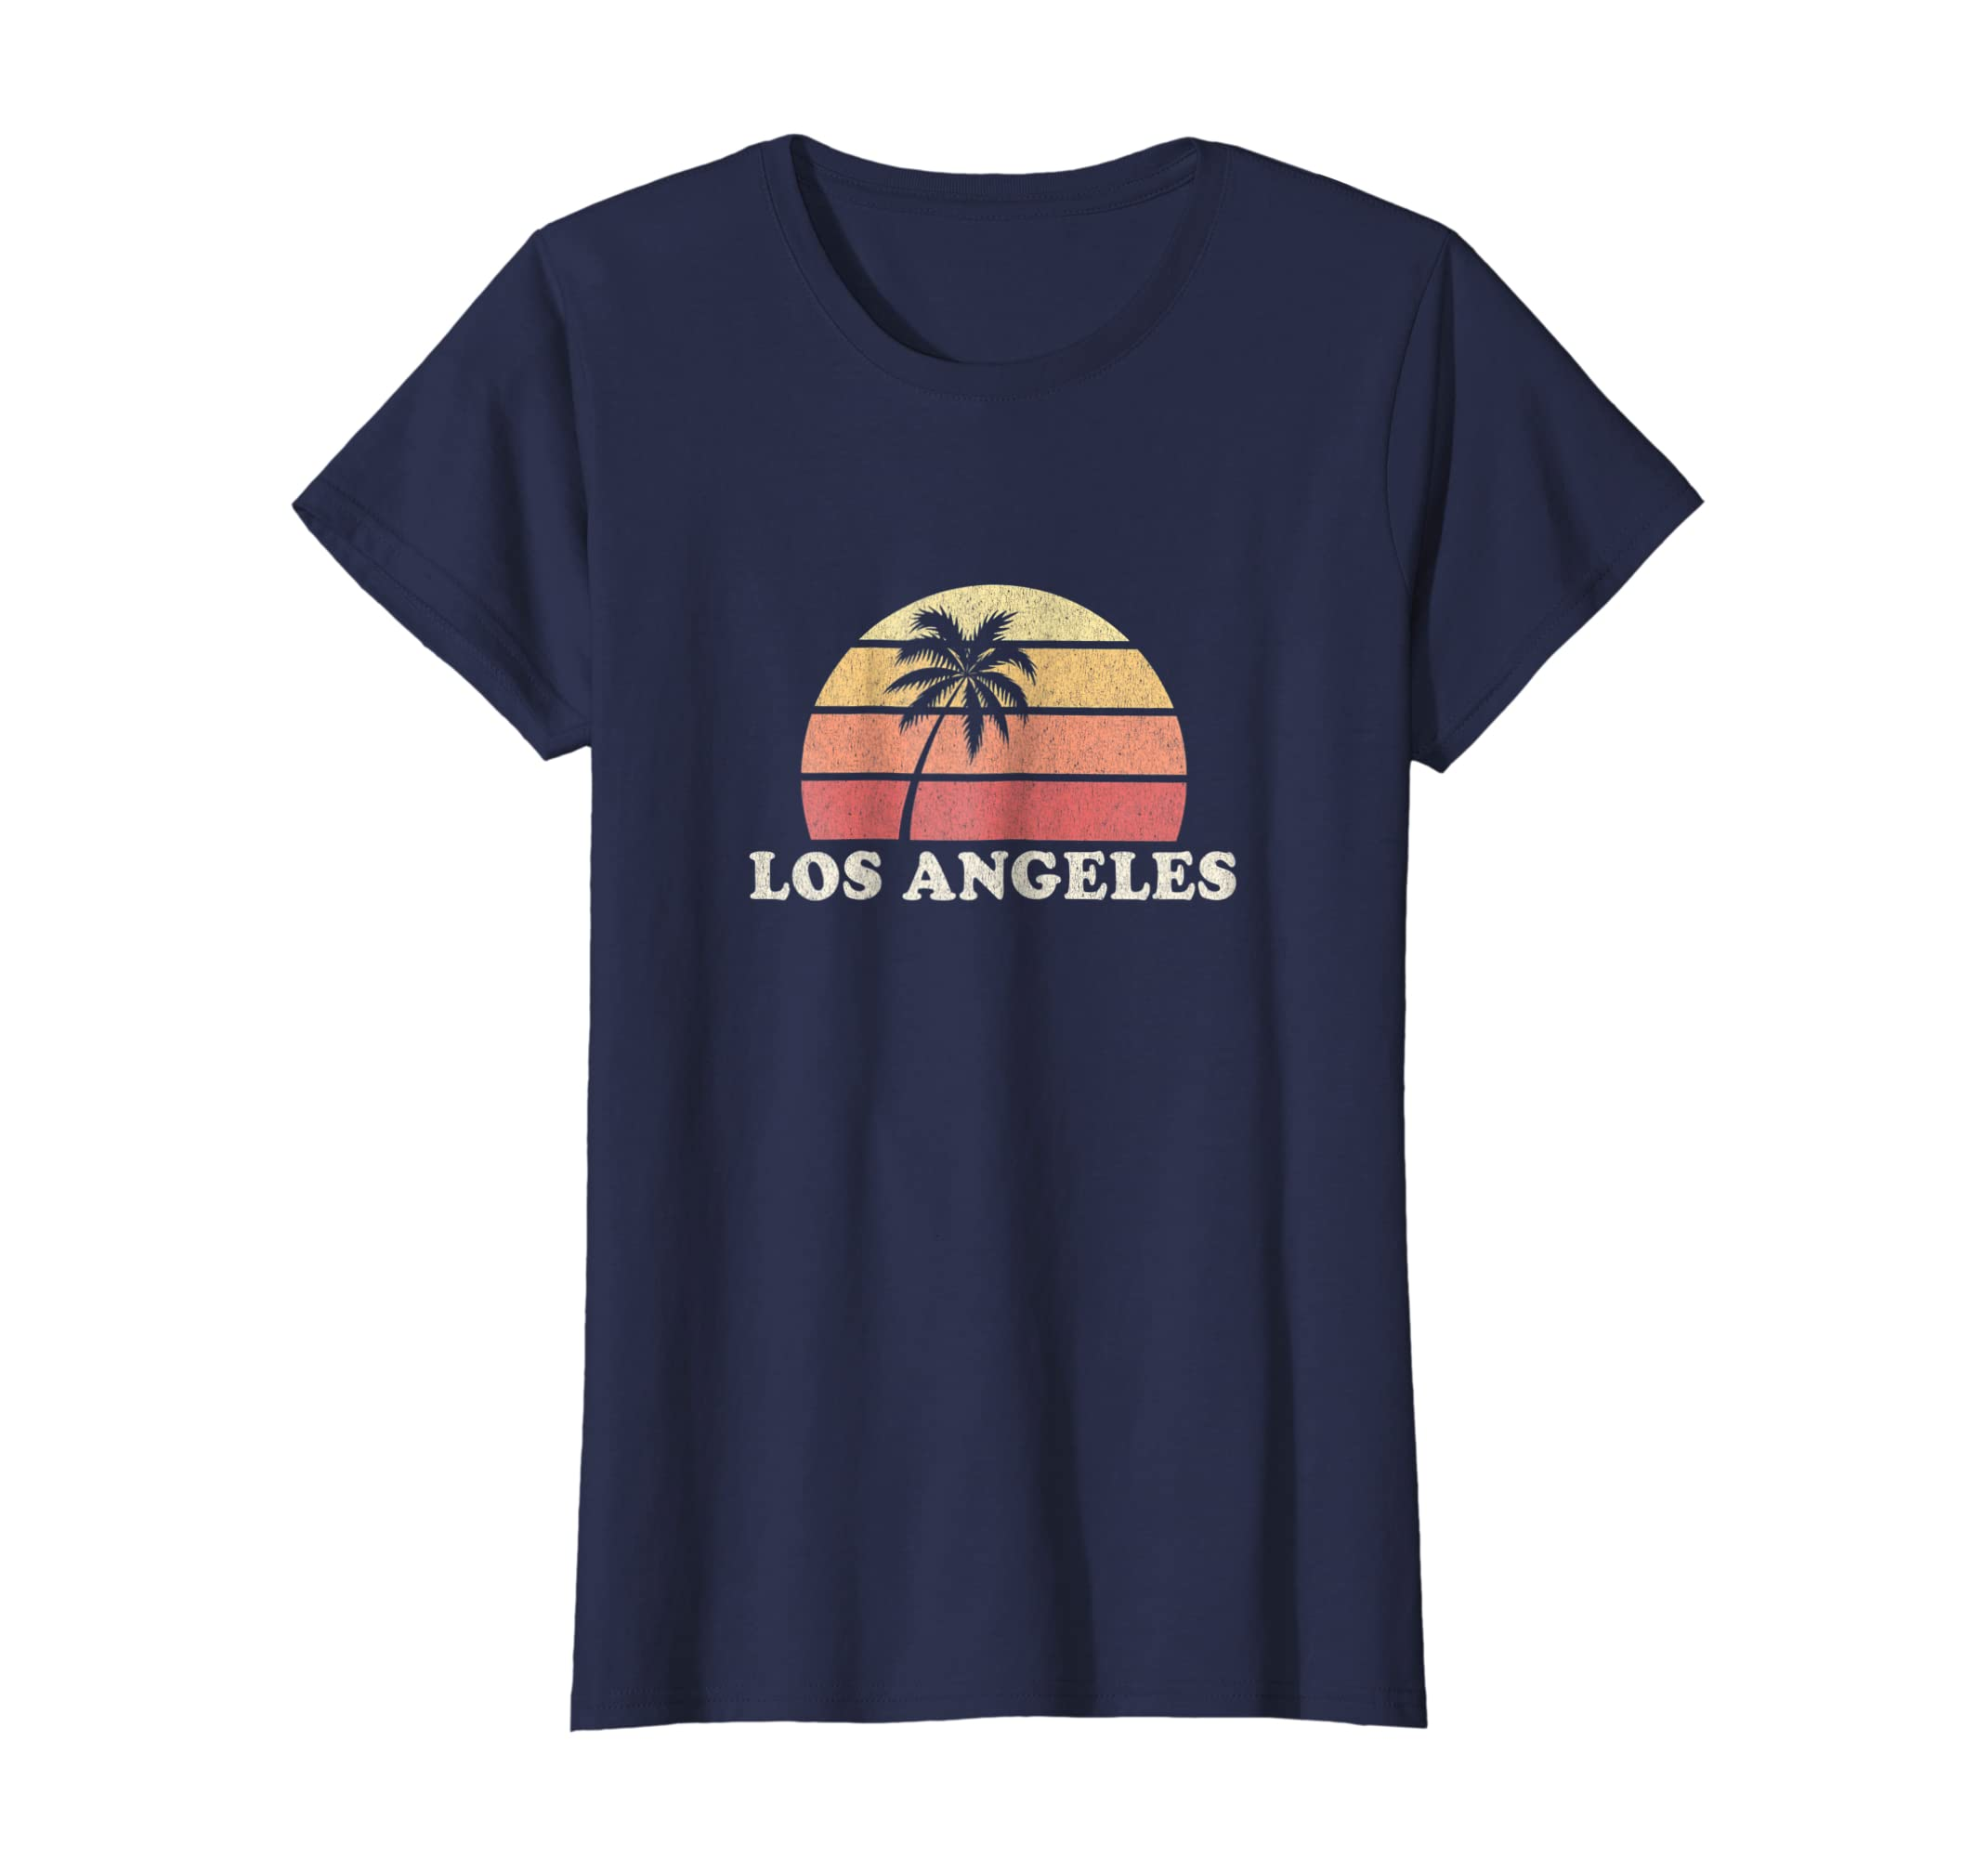 af83ceff61 Amazon.com: Los Angeles LA CA Vintage T Shirt Retro 70s Throwback Tee:  Clothing